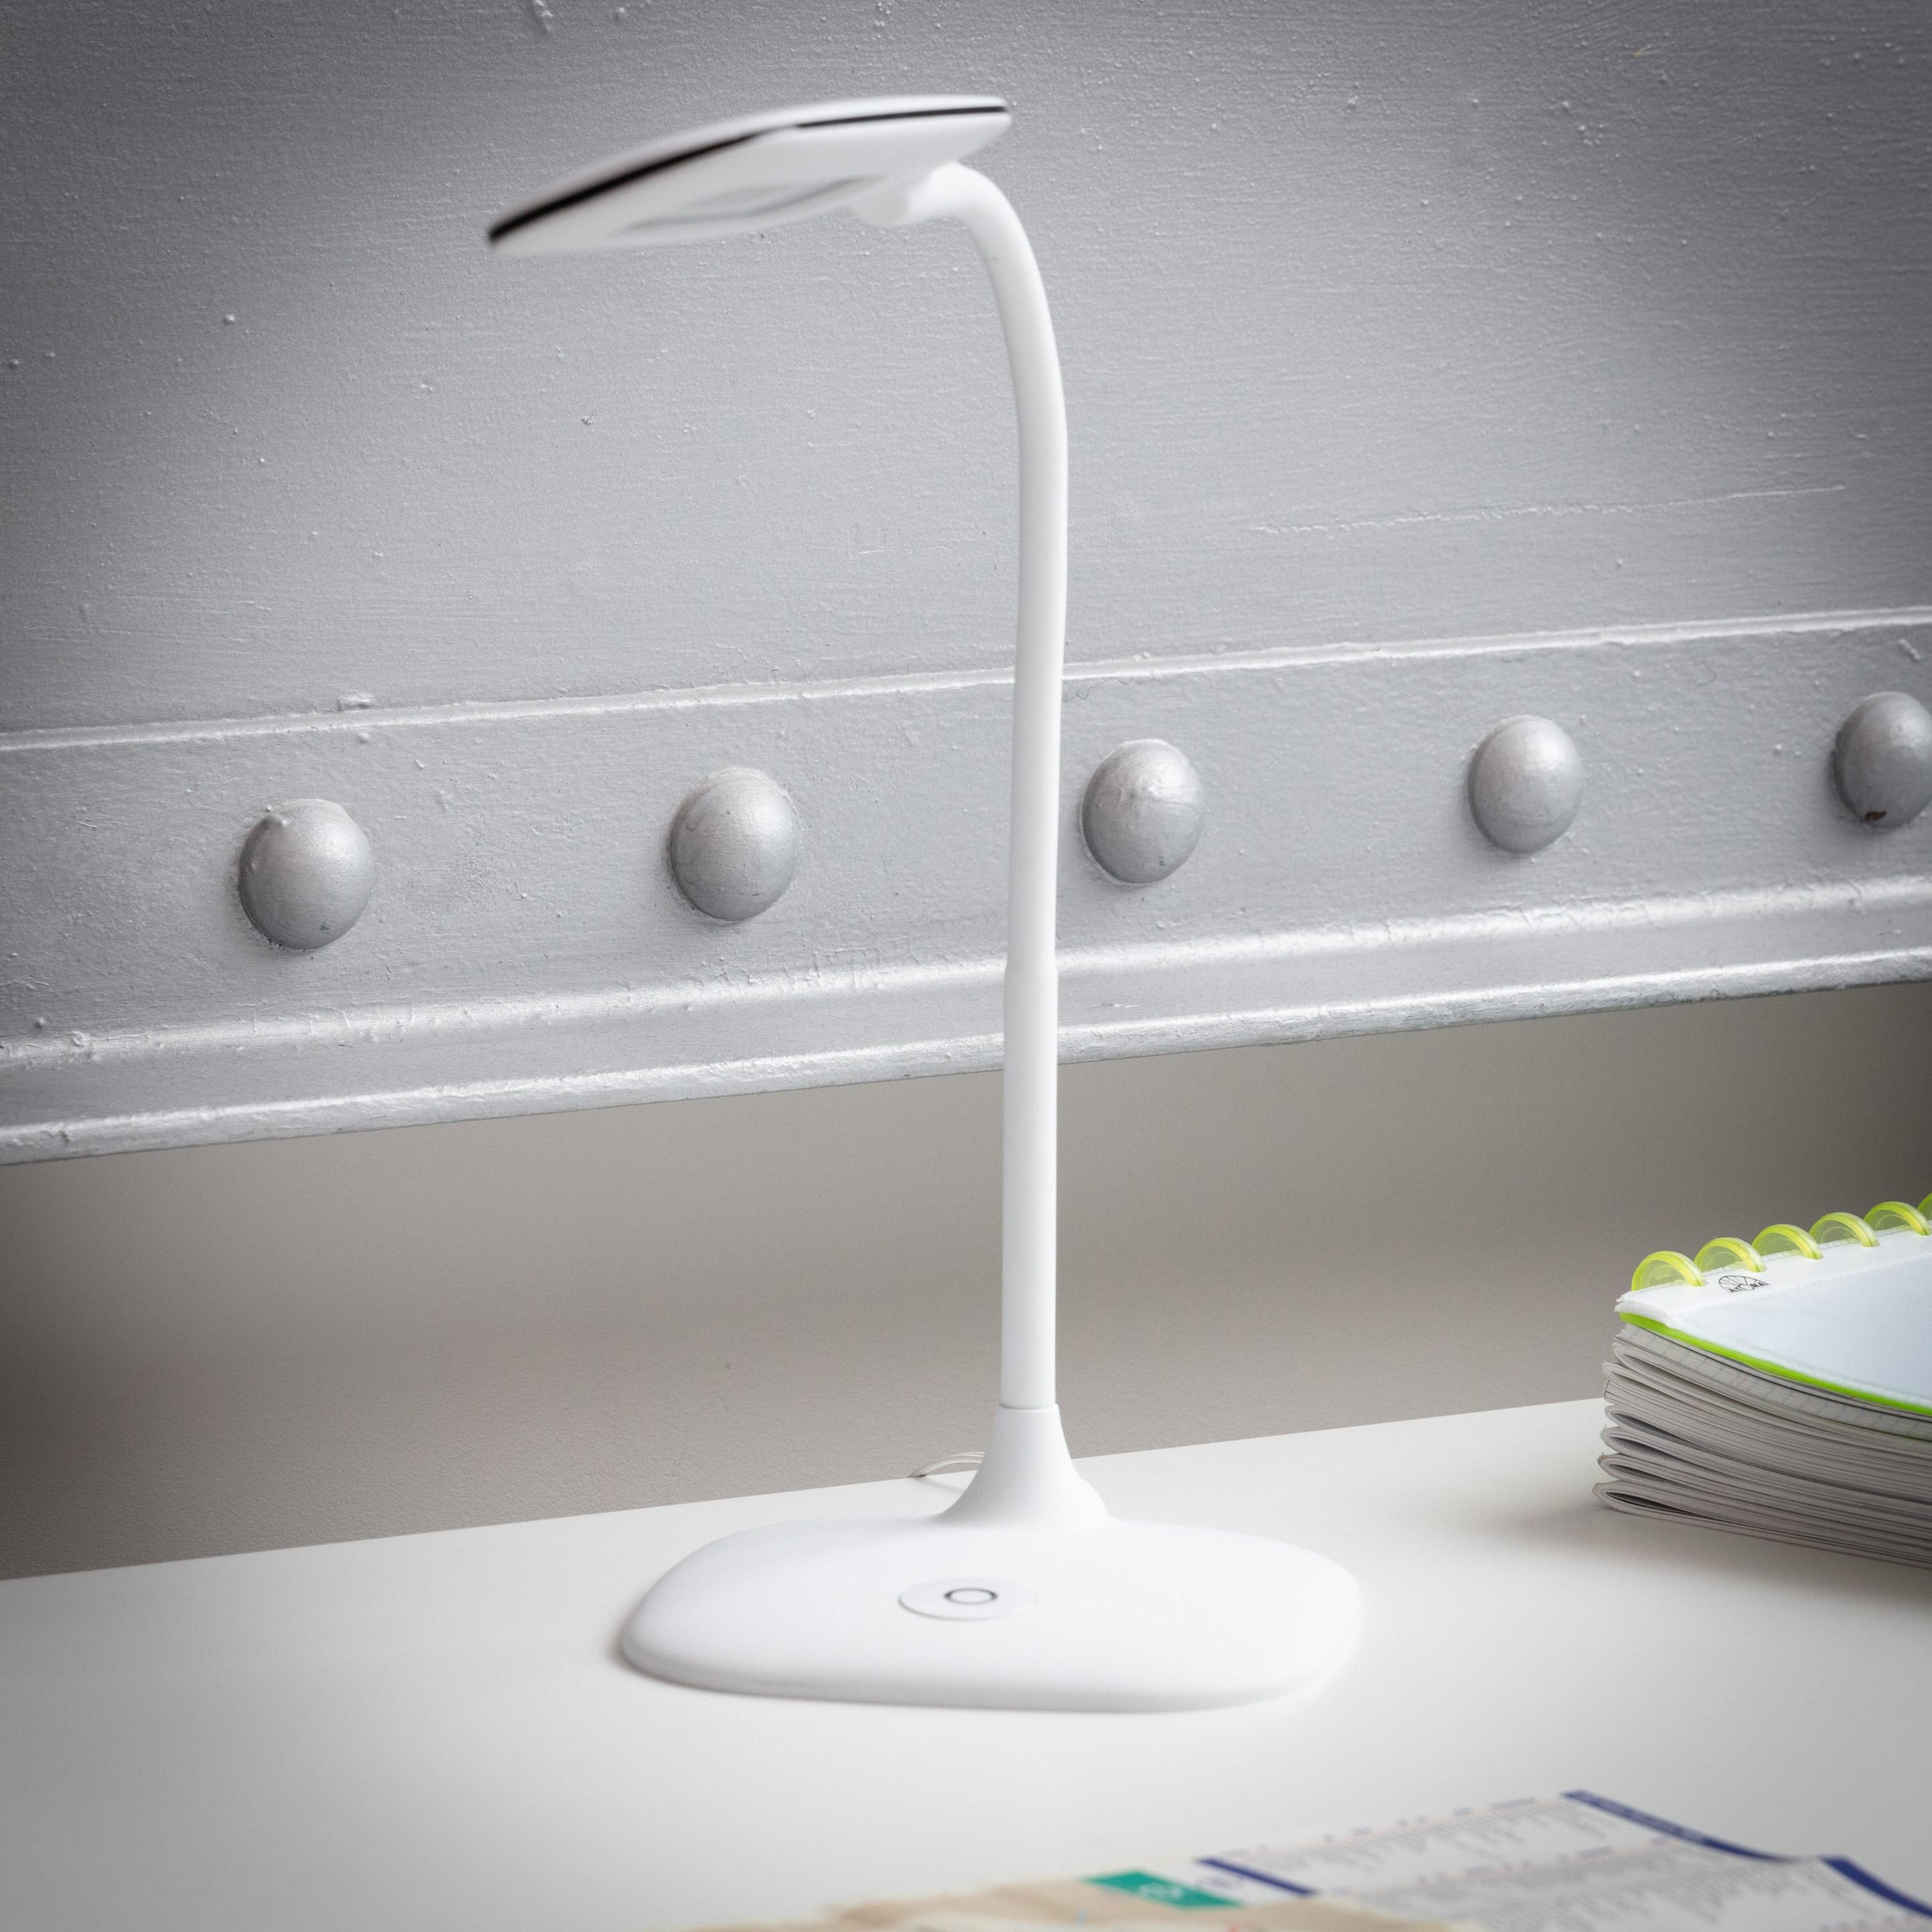 Lampe de bureau, design, plastique blanc, INSPIRE Led Mei